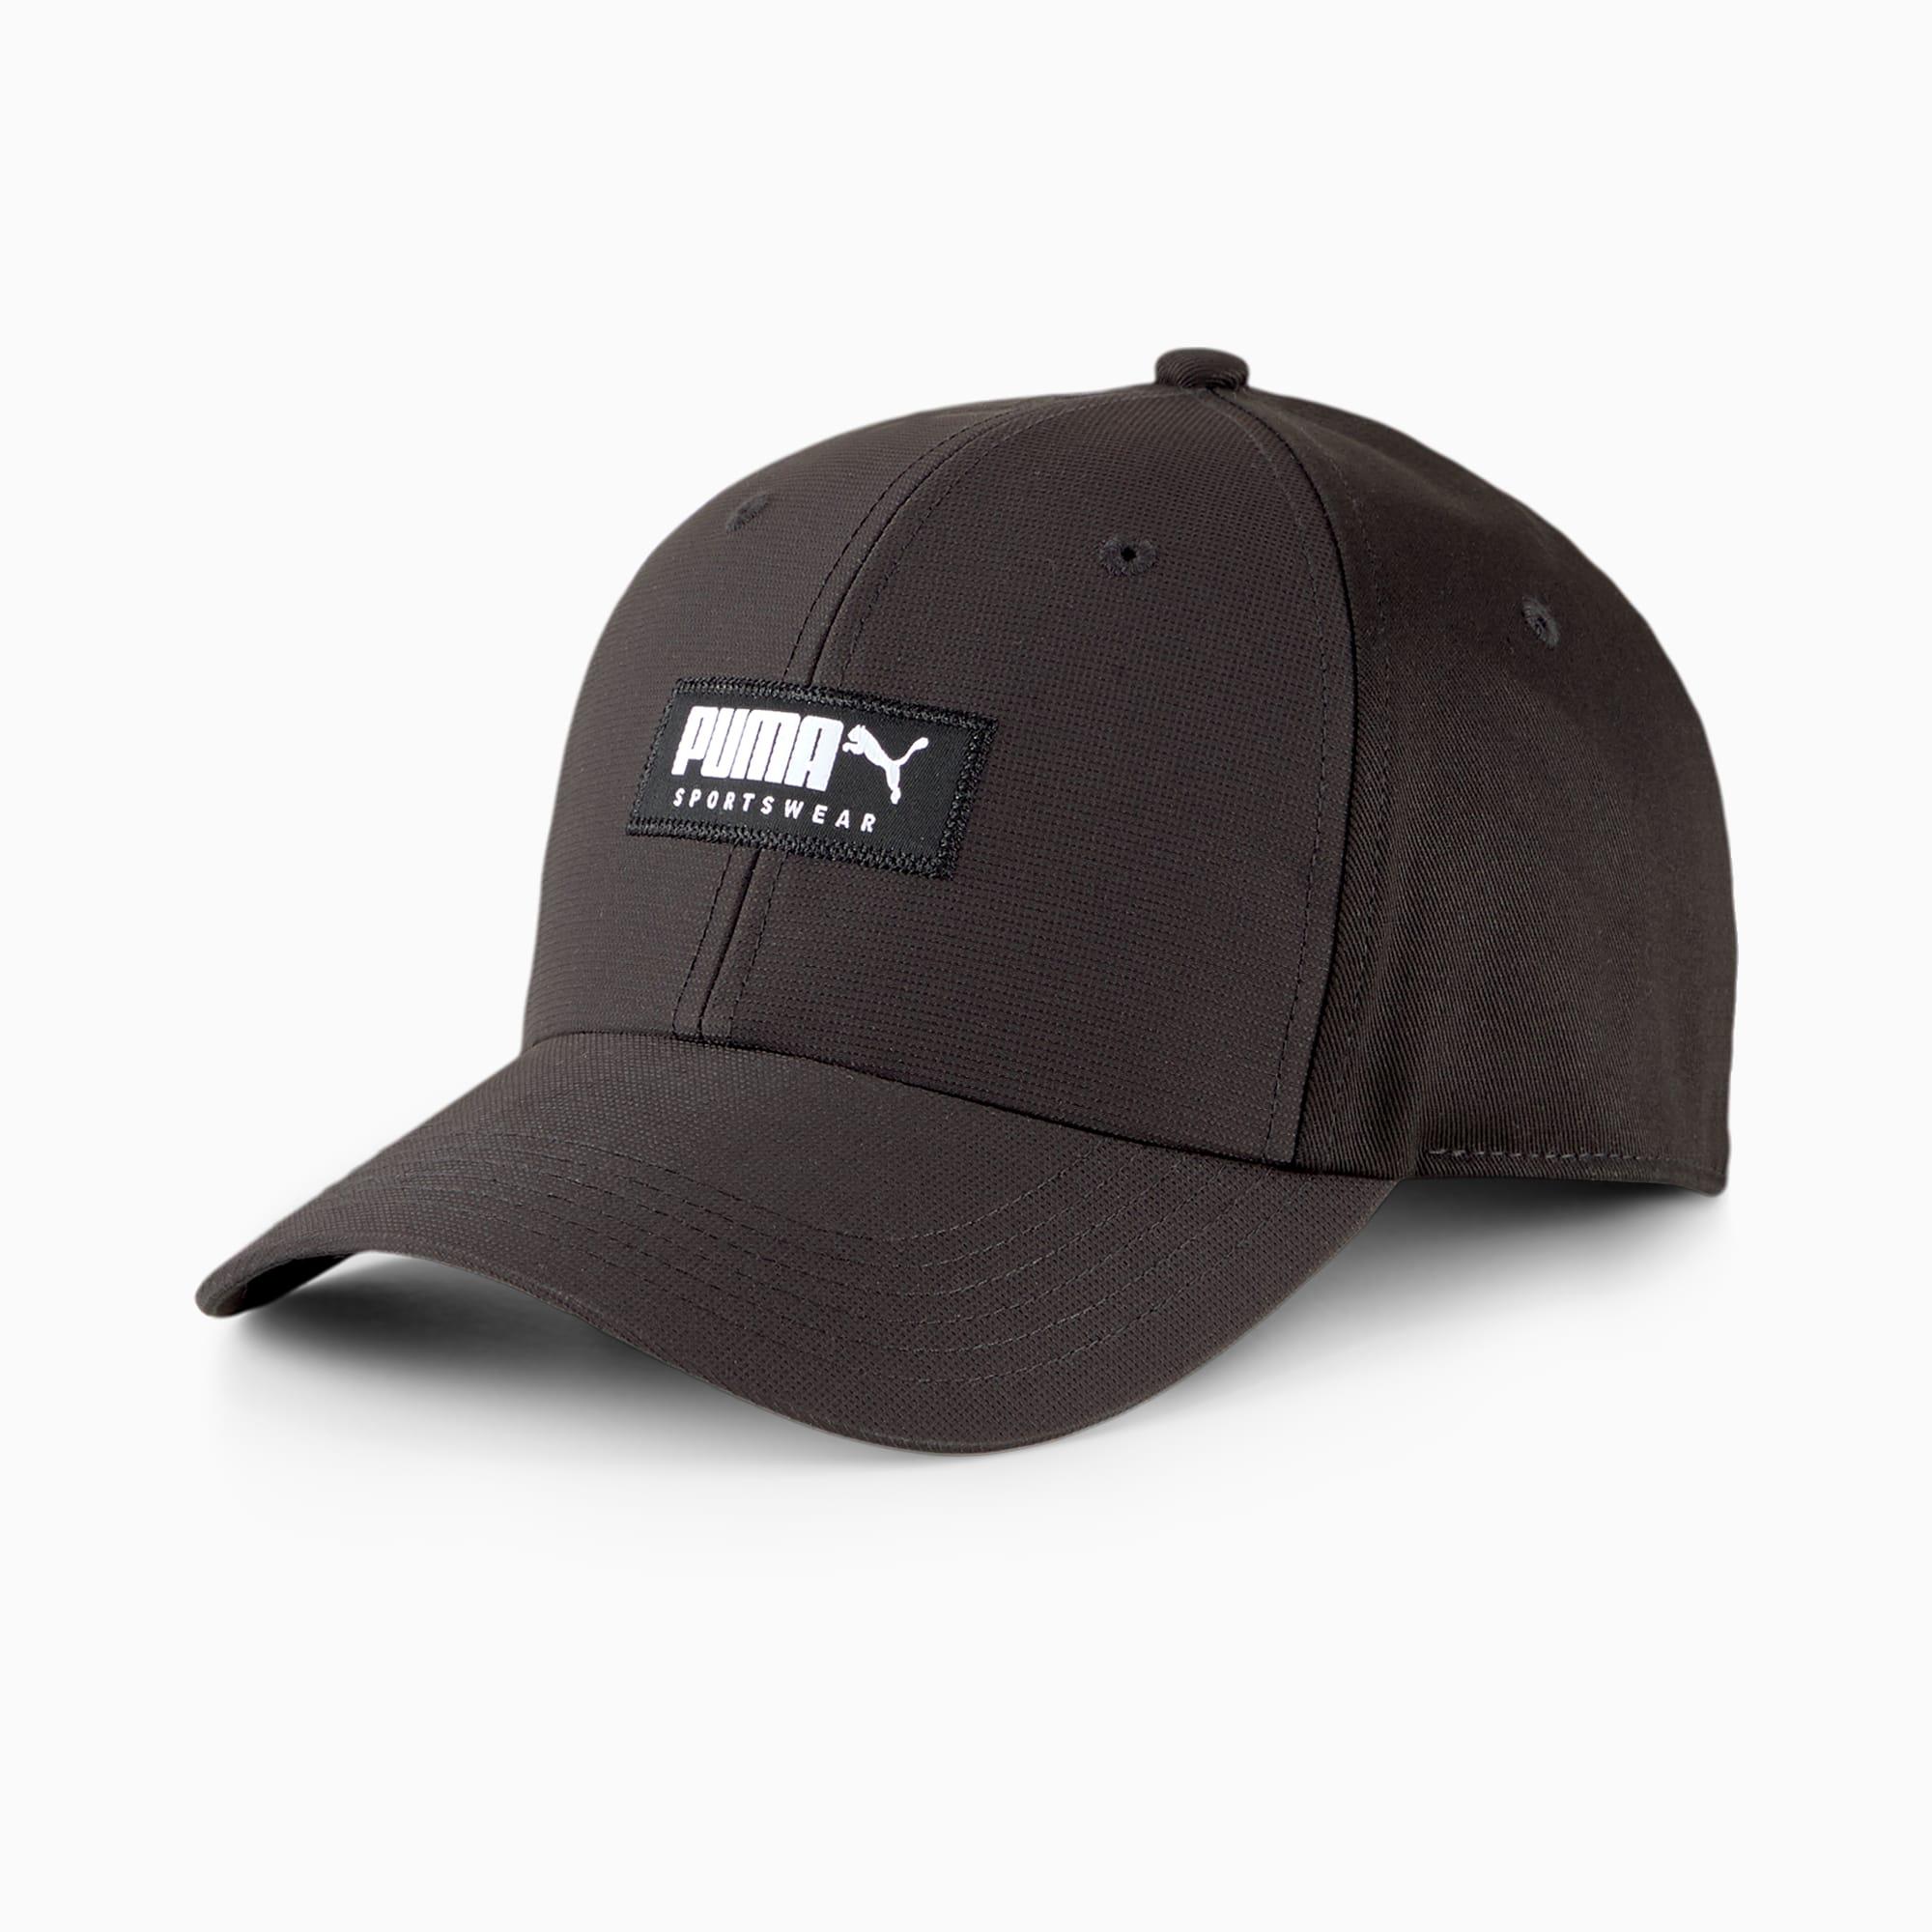 Casquette de baseball Style, Noir, Accessoires - PUMA - Modalova